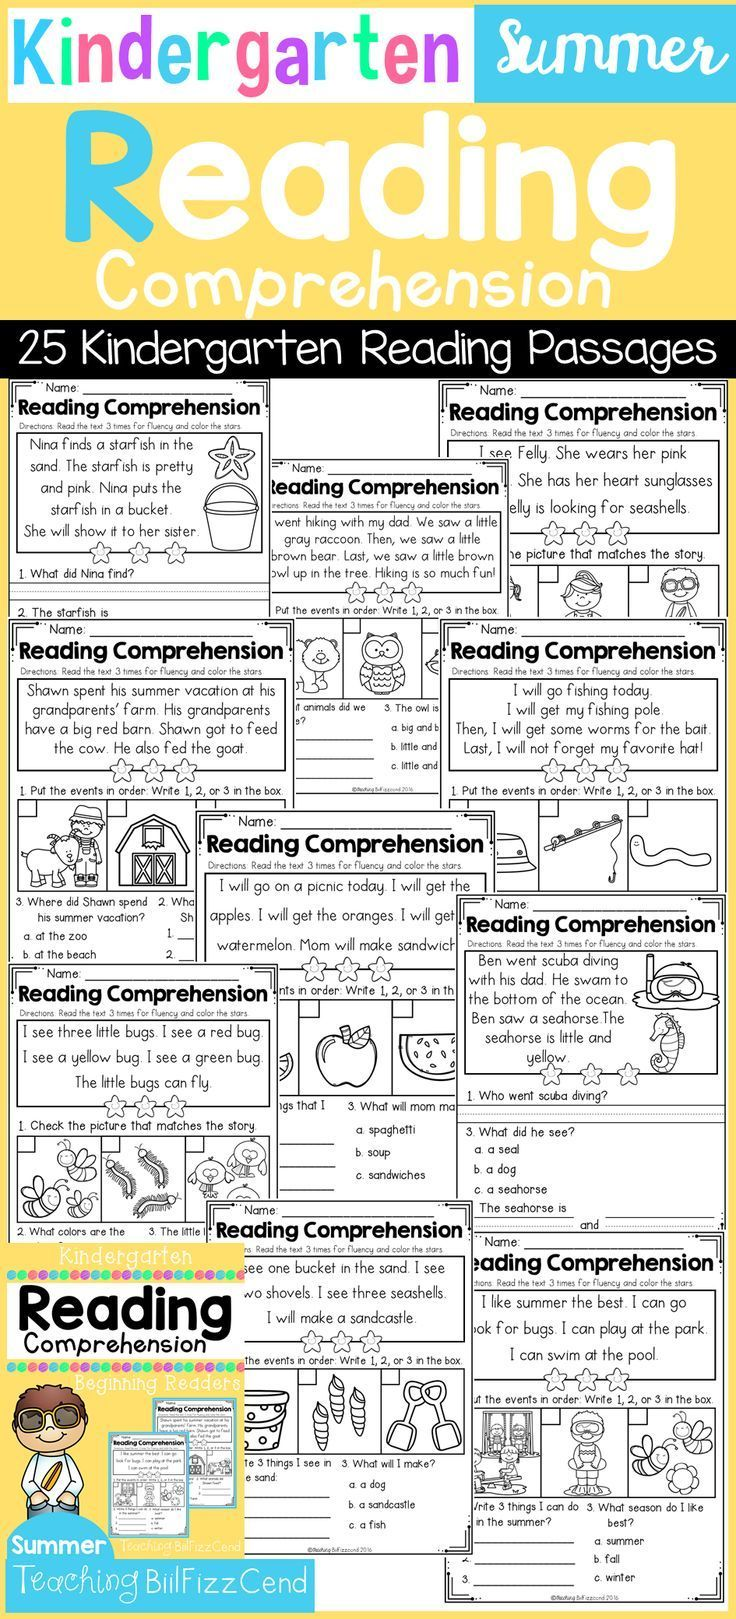 Kindergarten Reading Comprehension Summer Edition Reading Comprehension Reading Comprehension Kindergarten Kindergarten Reading [ 1619 x 736 Pixel ]